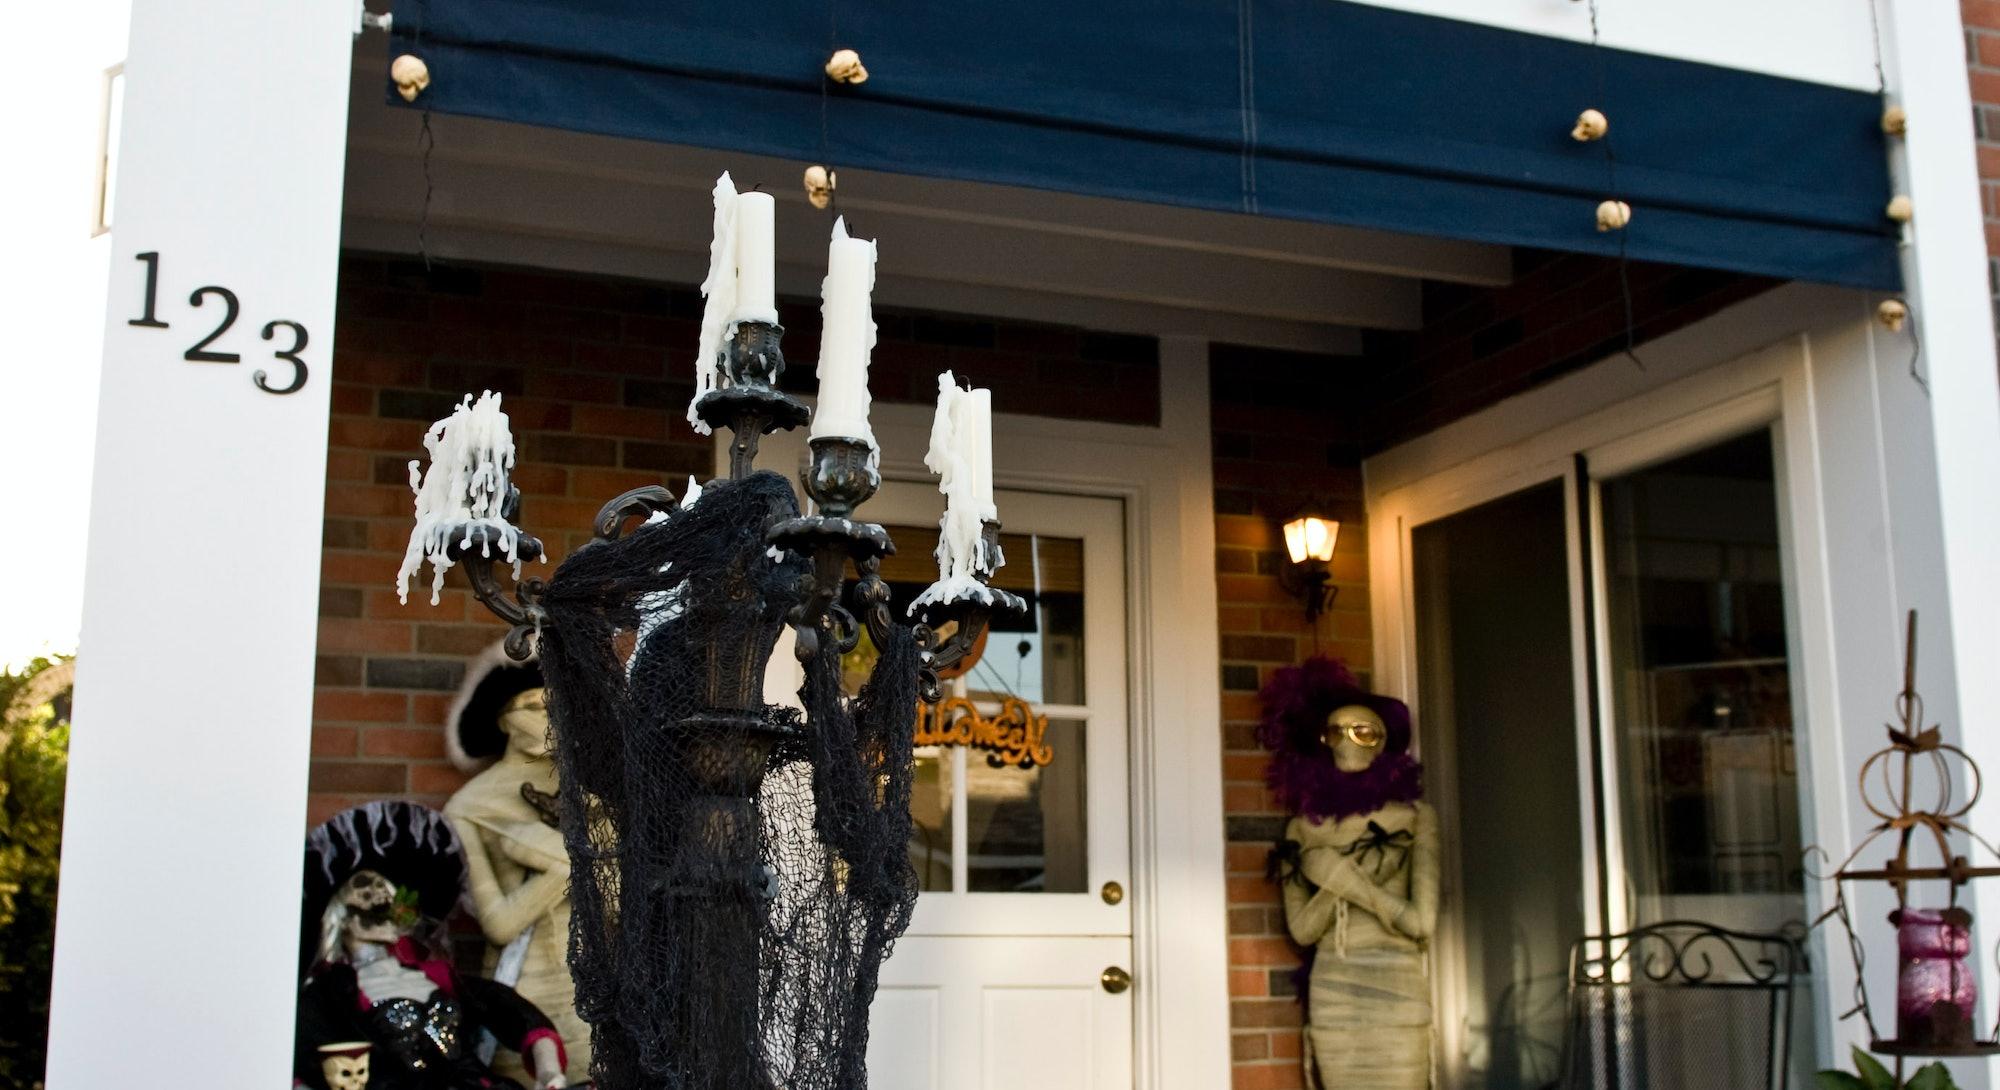 COSTA MESA, CA - OCTOBER 18: The Halloween decorations at the Balboa Island home of Donna Hood locat...